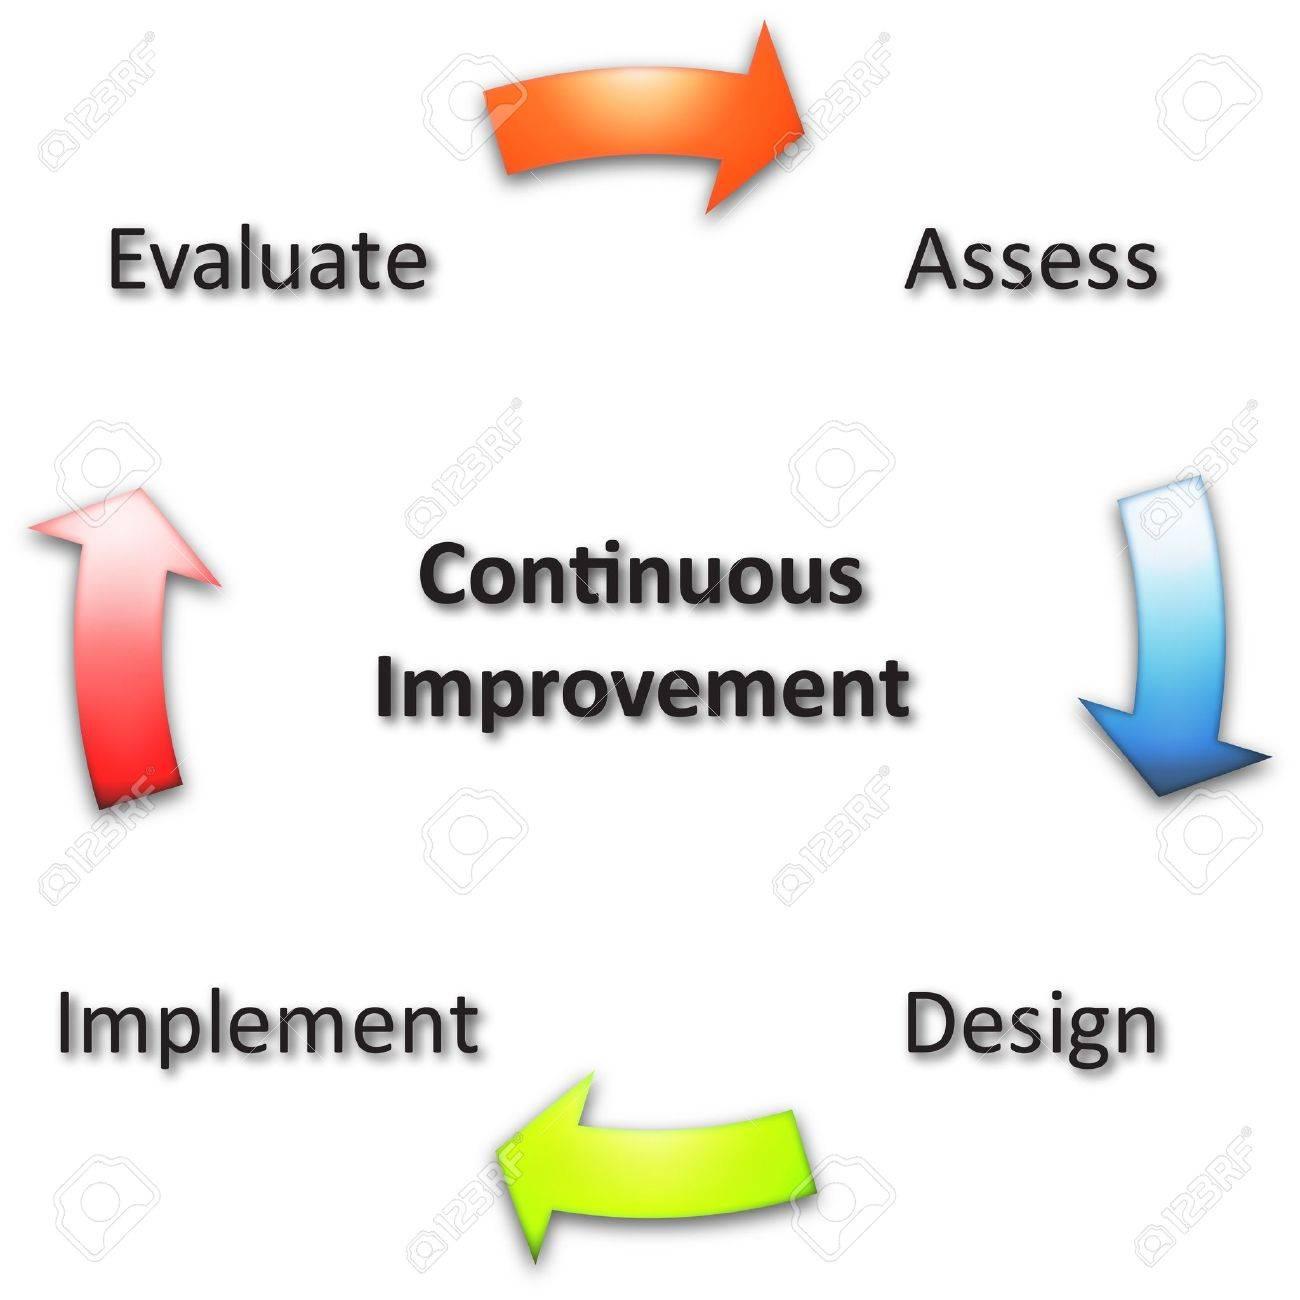 continuous improvement business diagram management strategy    illustration   continuous improvement business diagram management strategy concept chart illustration